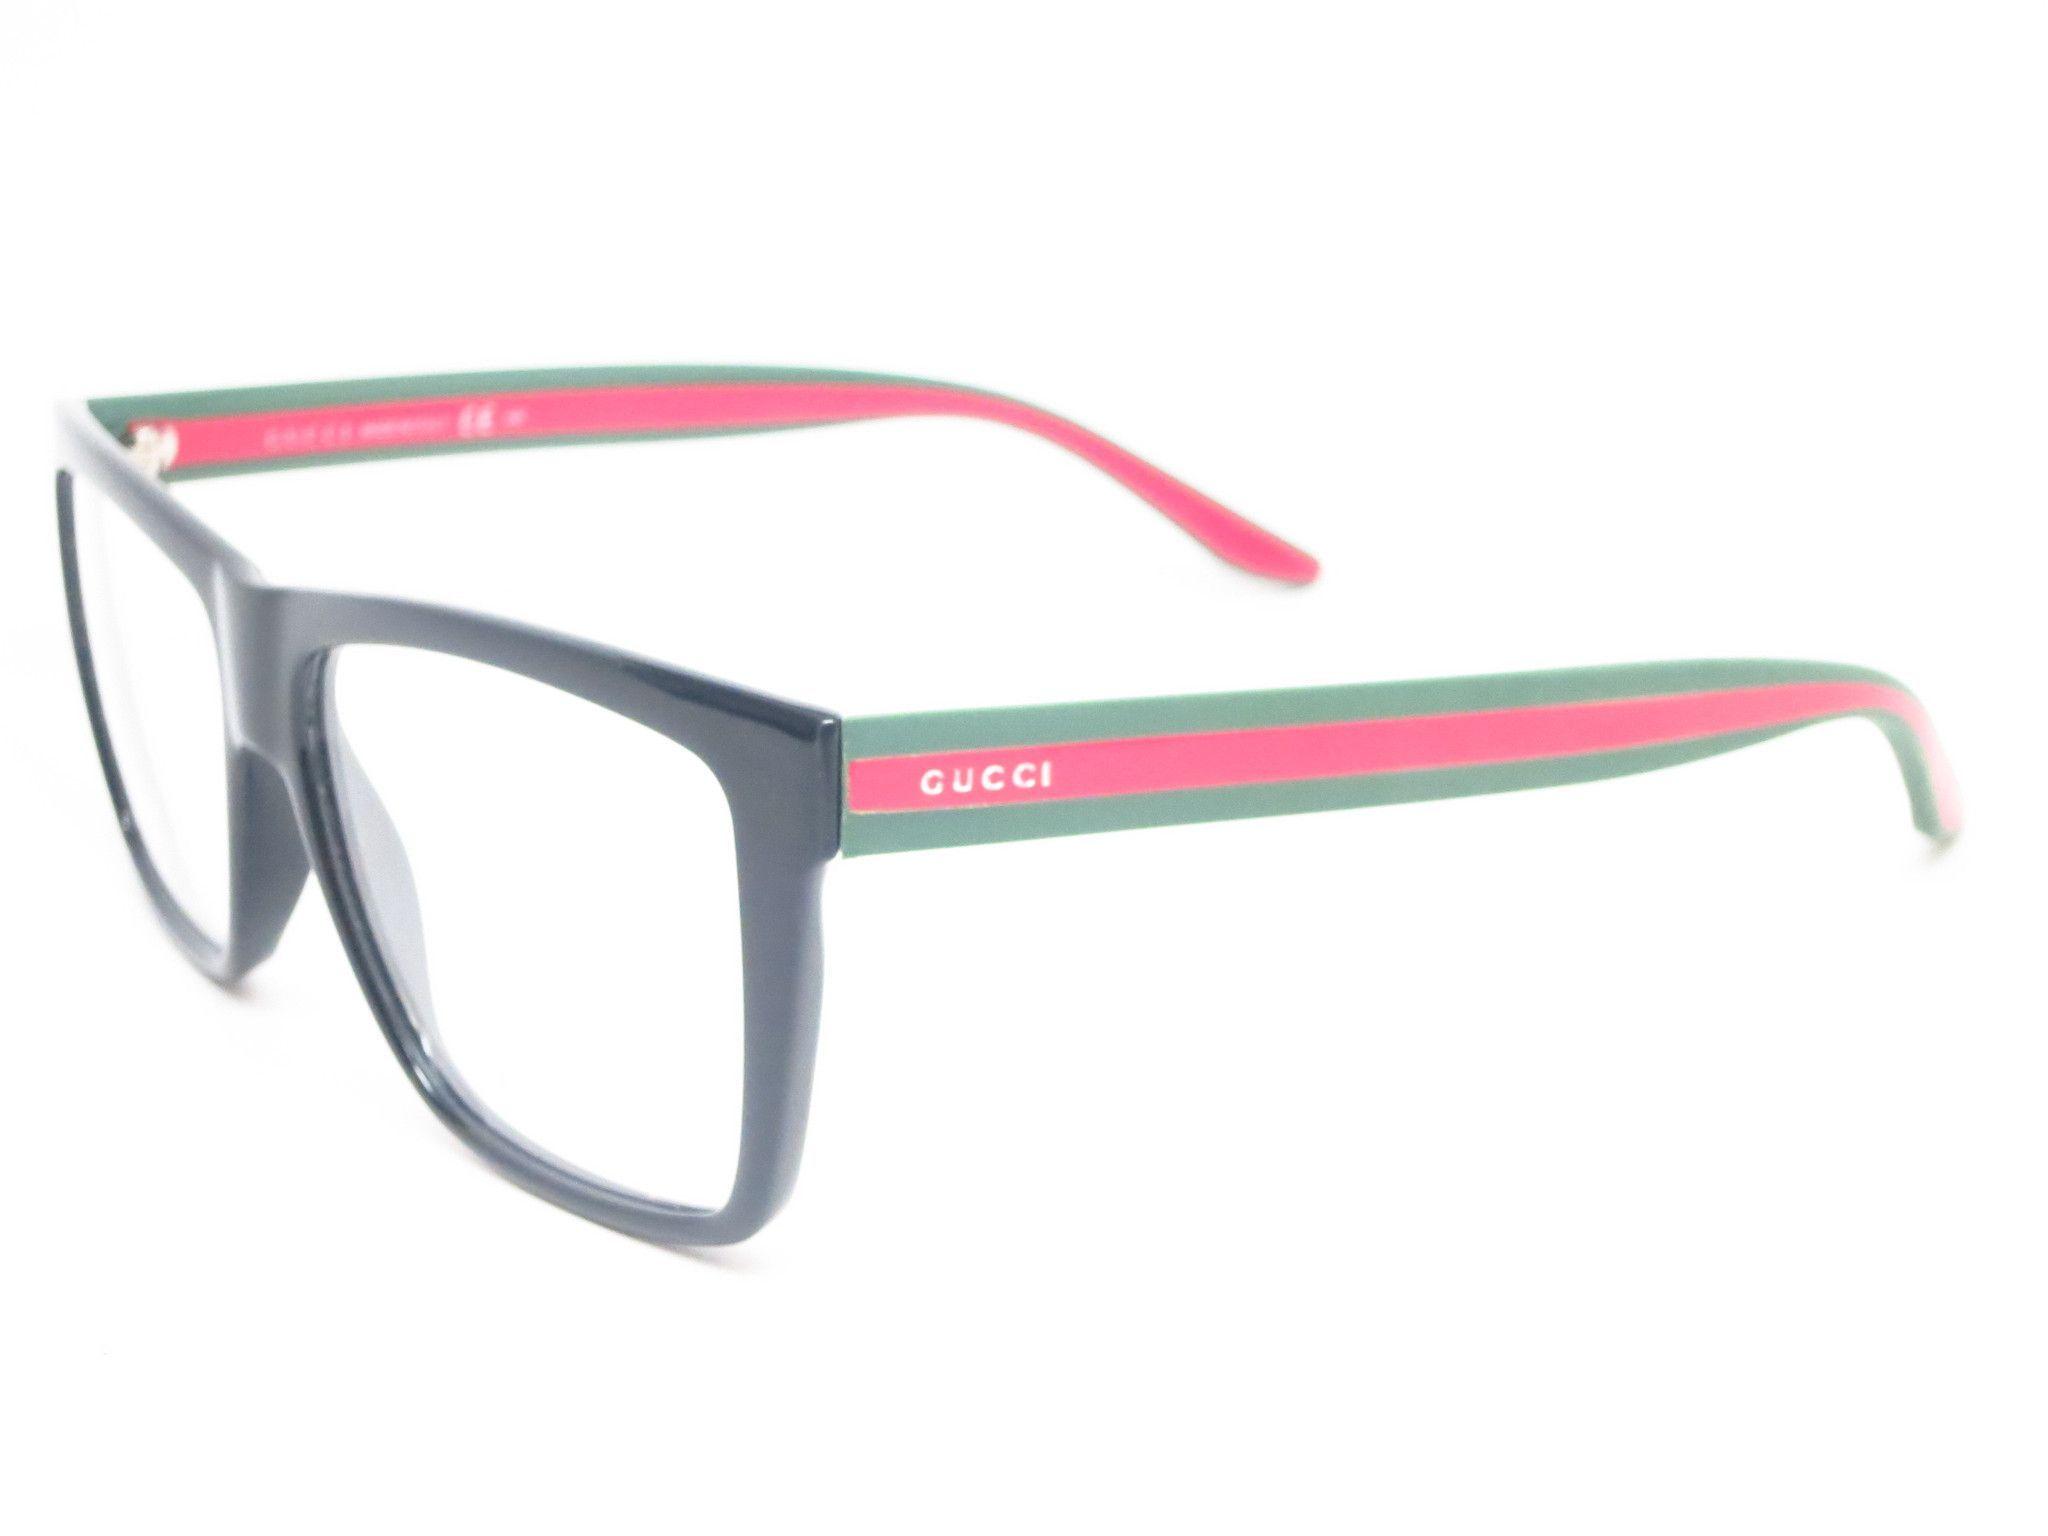 Gucci GG 1008 Black Green Red 51N Eyeglasses | Anteojos